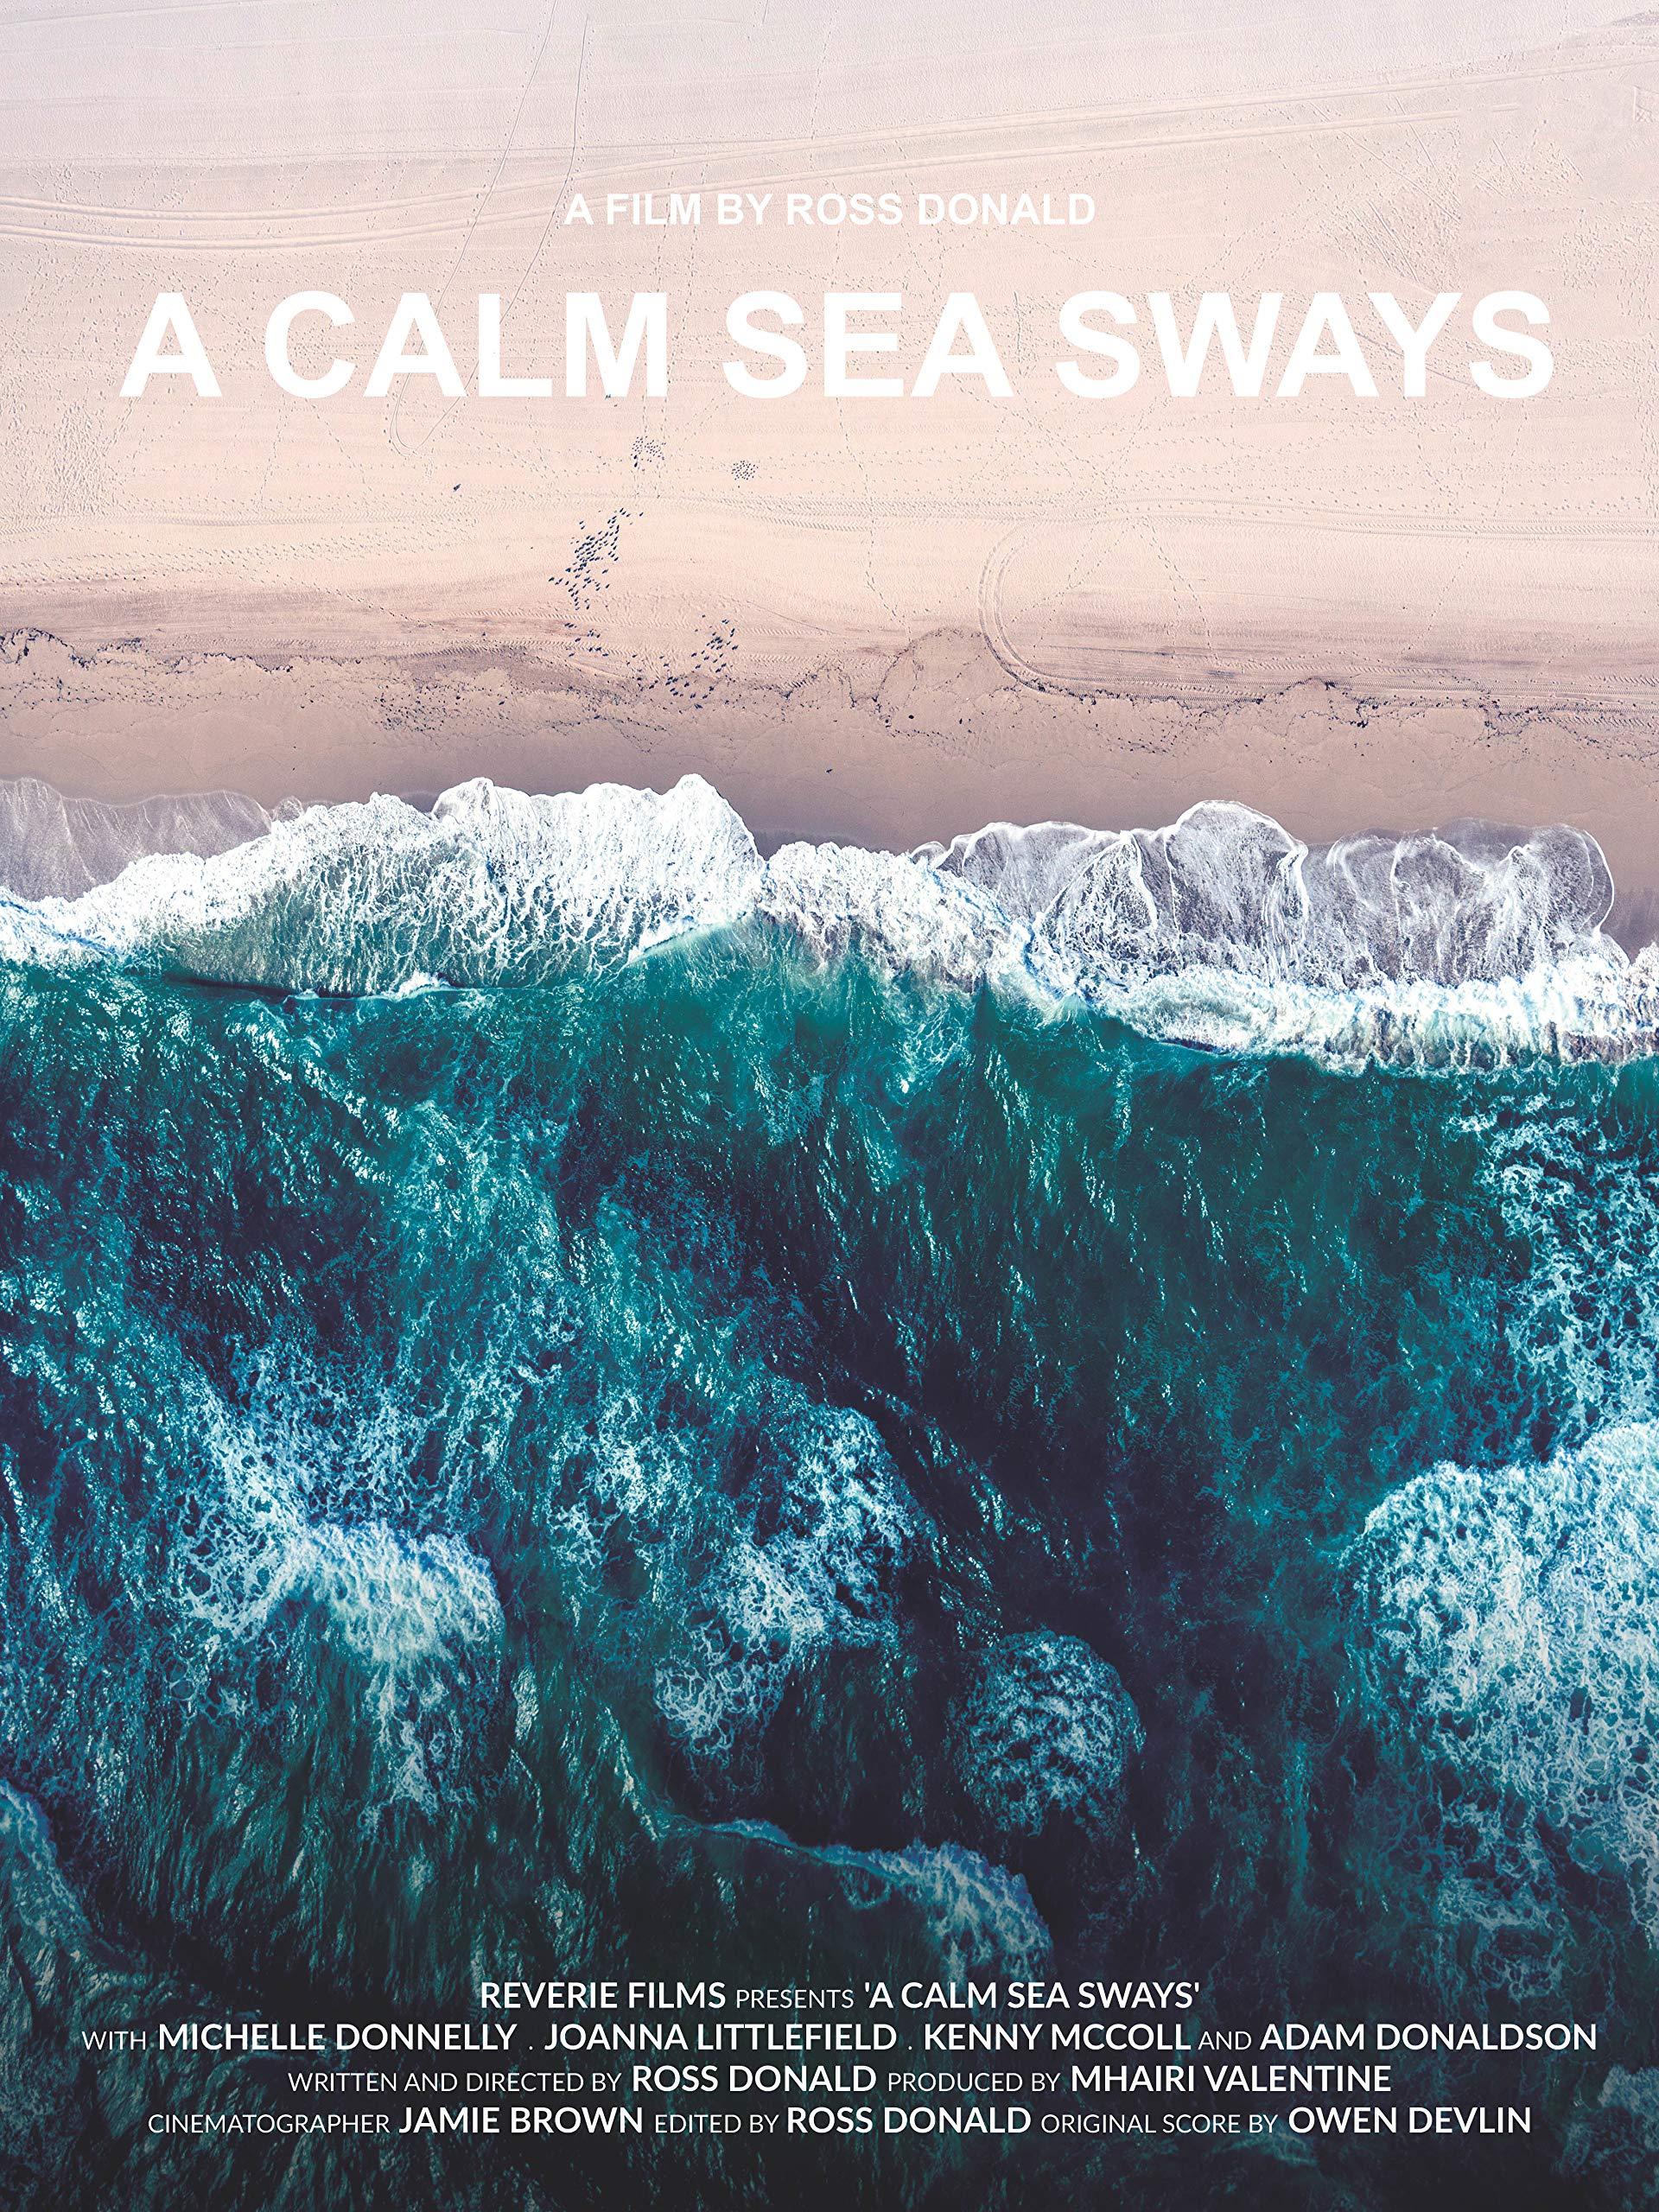 A Calm Sea Sways